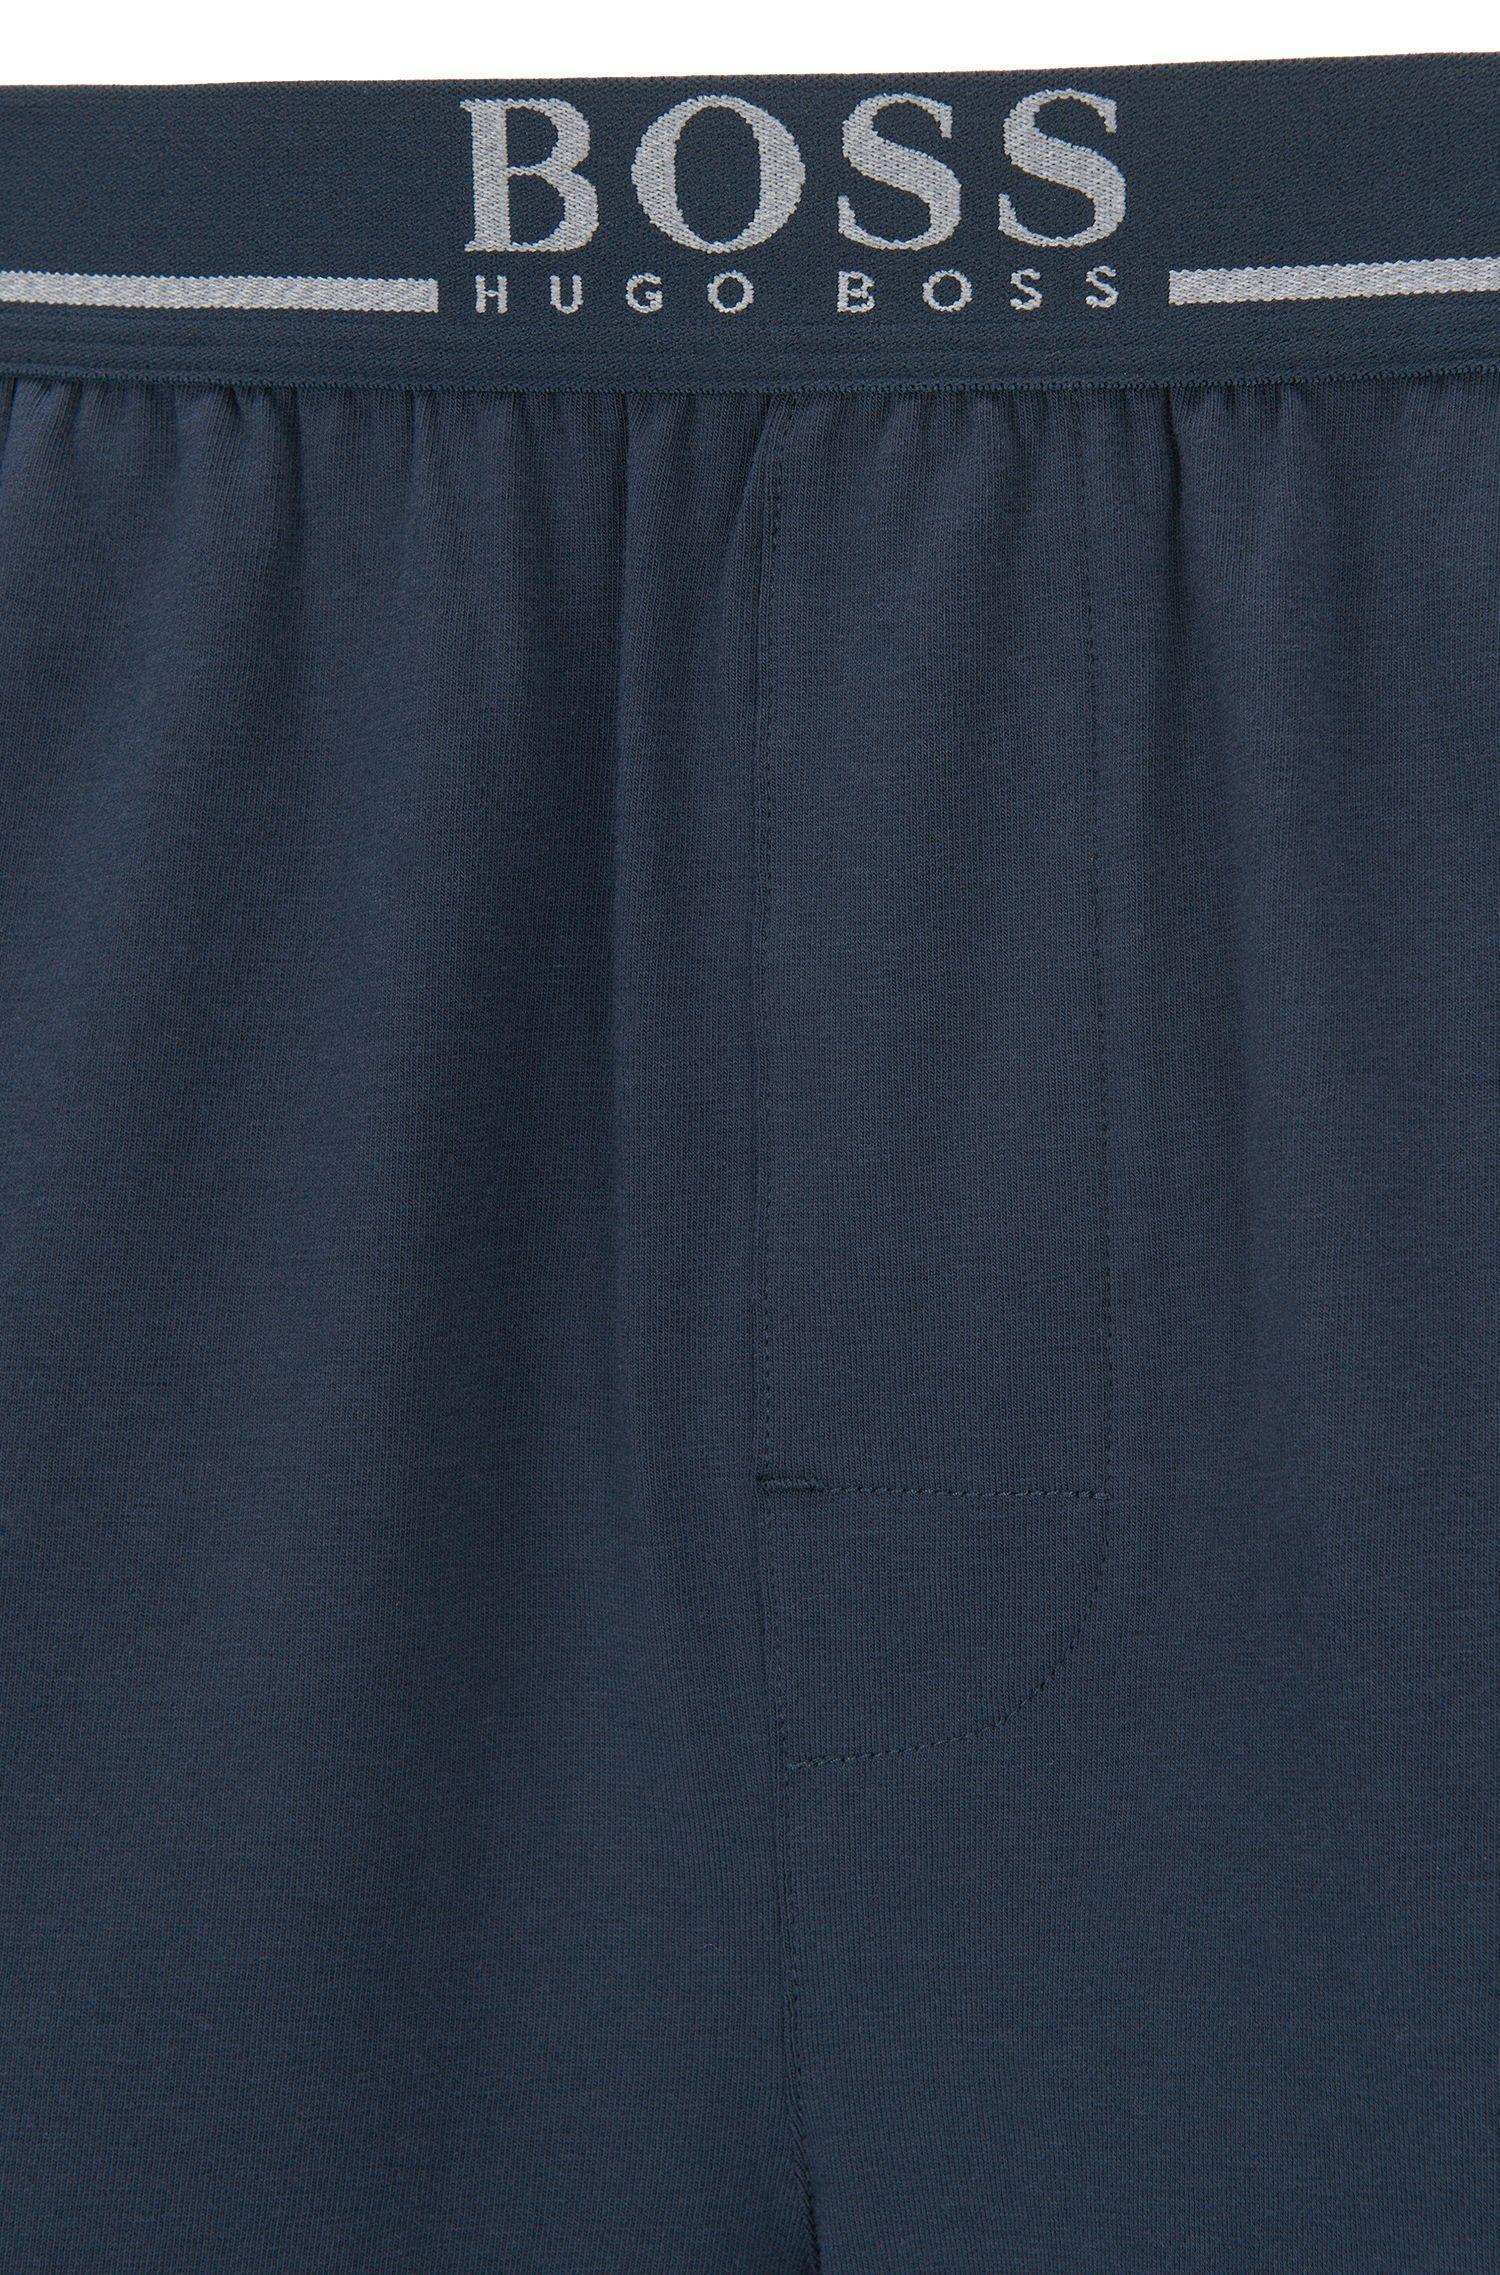 437a7e00 BOSS - Blue Loungewear Shorts In Stretch Cotton for Men - Lyst. View  fullscreen